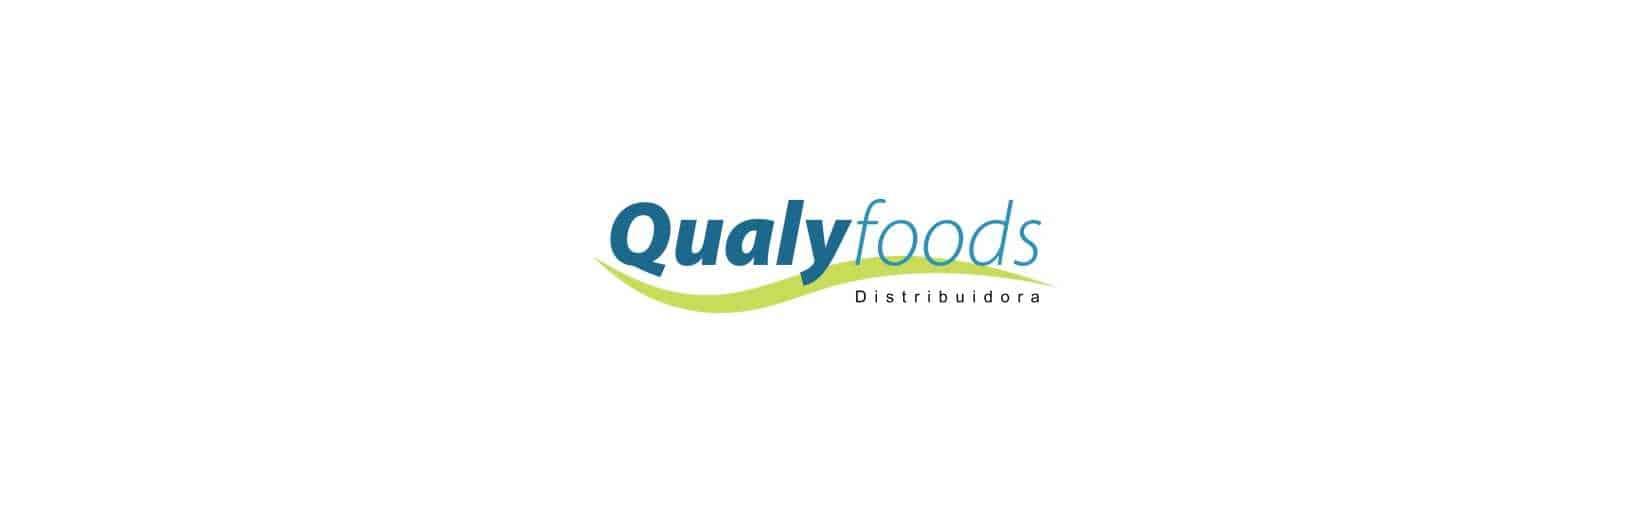 QualyFoods